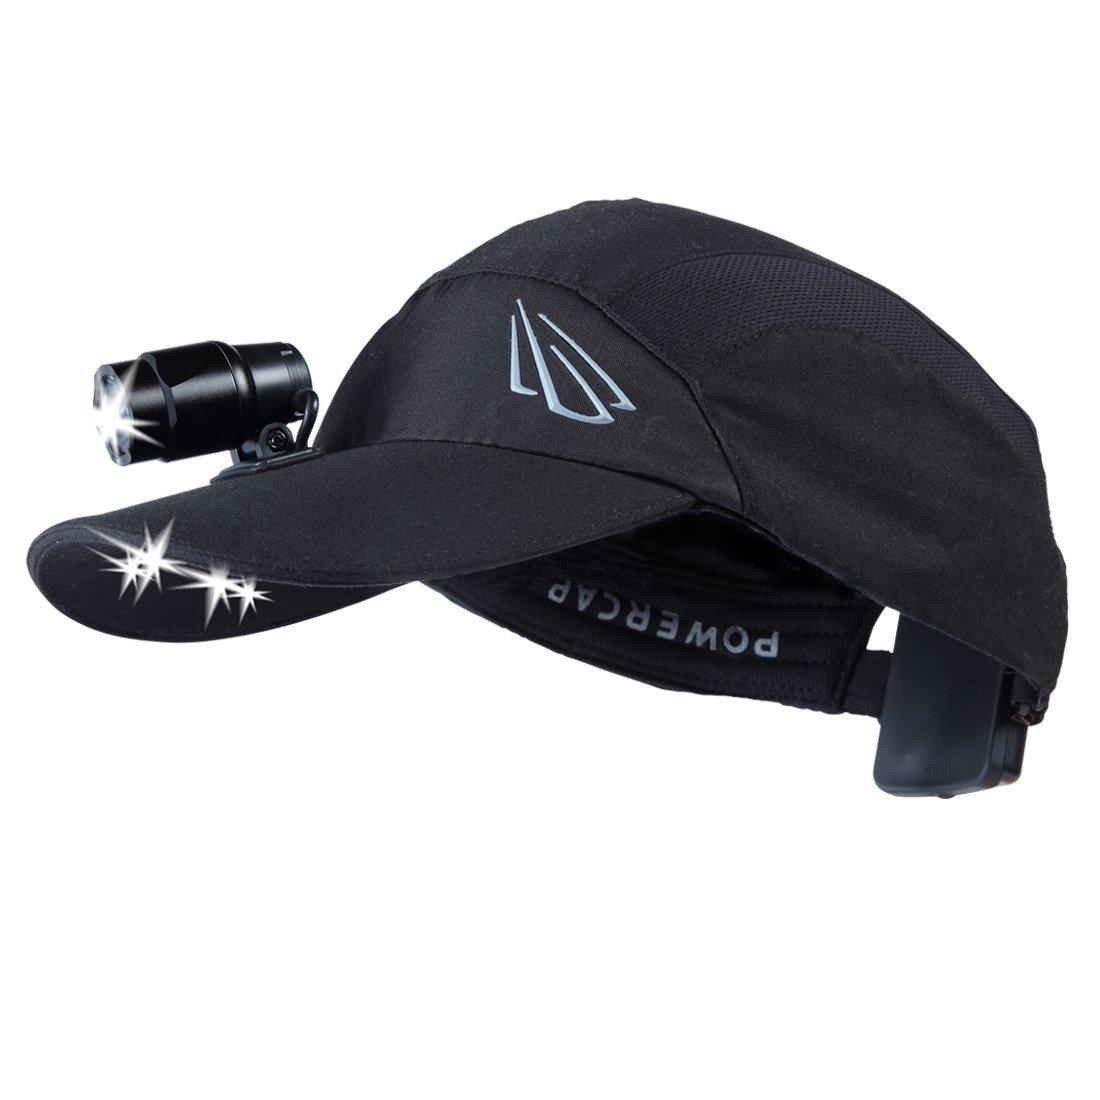 Panther Vision HLH-1606 Unstructured Microfiber Headlight Hat, Black [並行輸入品] B06XFBQM6J